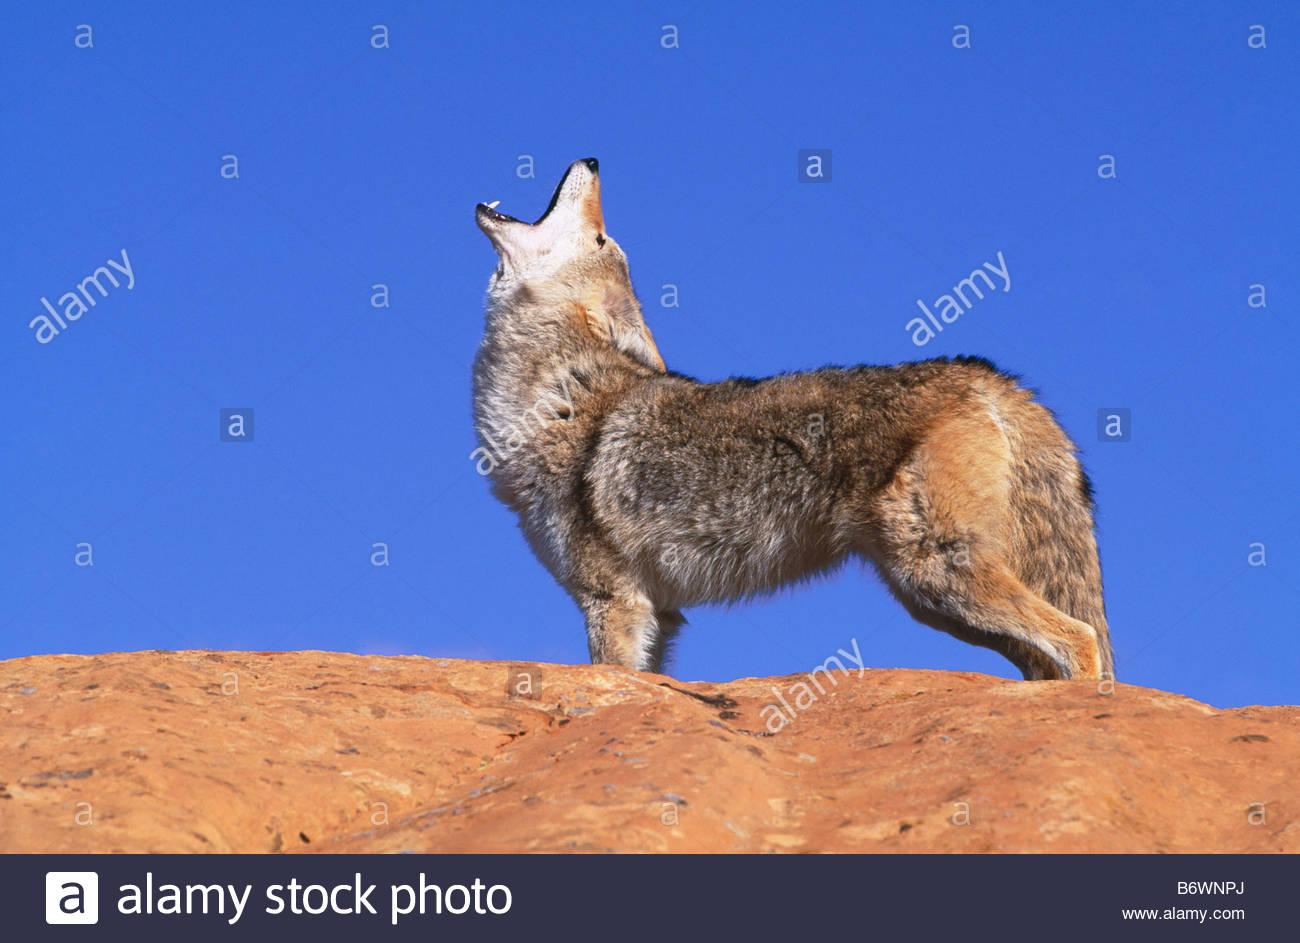 Howling coyote on rock Canis latrans Near Zion National Park High desert Colorado Plateau Southeastern Utah - Stock Image